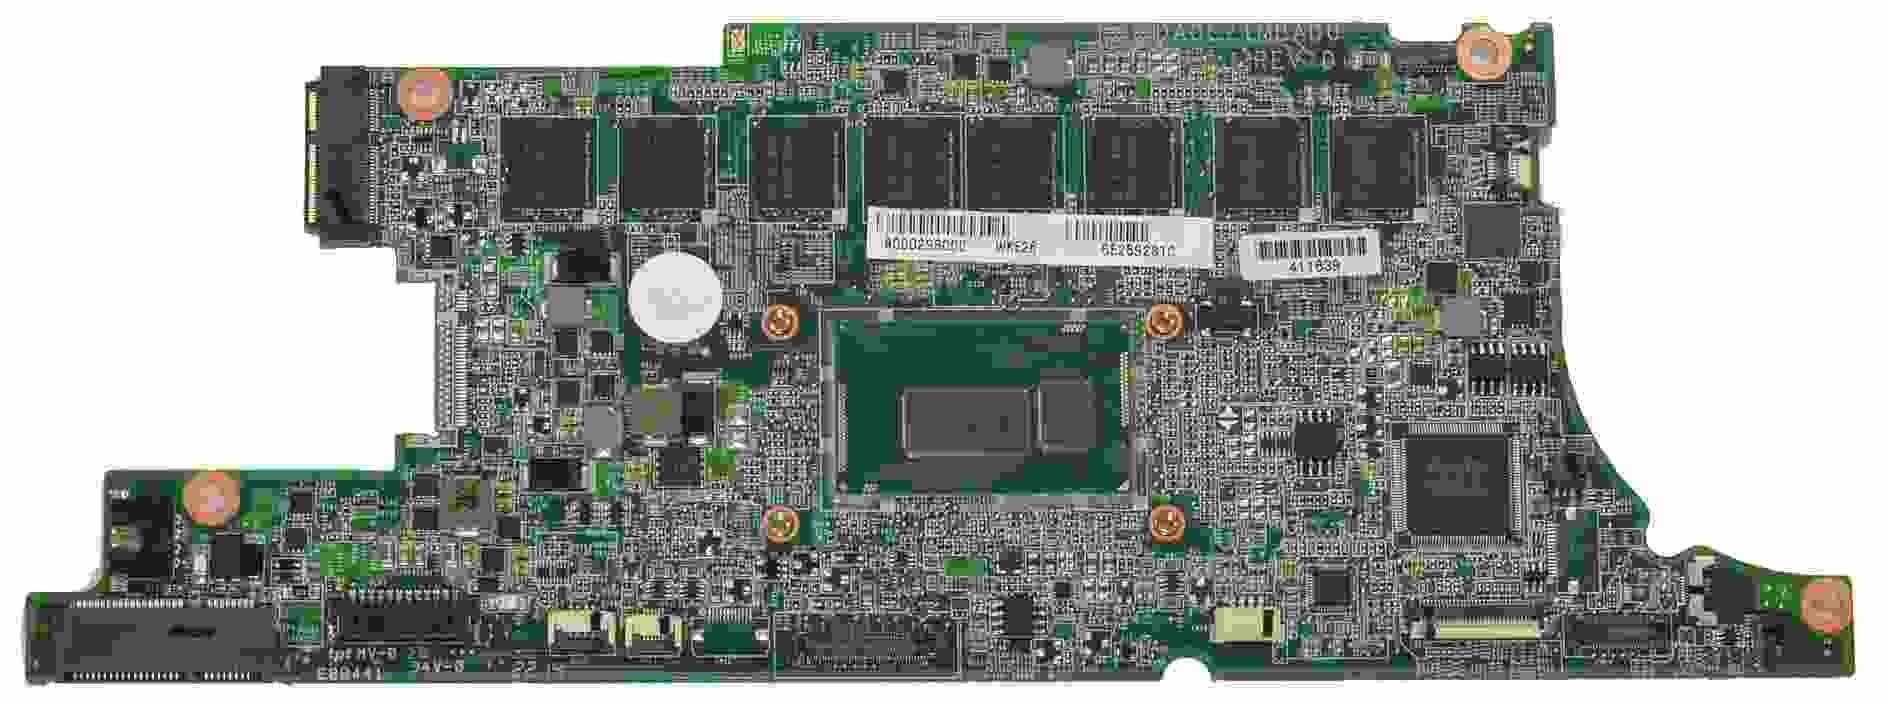 A000298000 Toshiba Satellite P35W Laptop Motherboard, Tarjeta madre 8GB con Intel i7-4510U 2G... + Toshiba en Veo y Compro